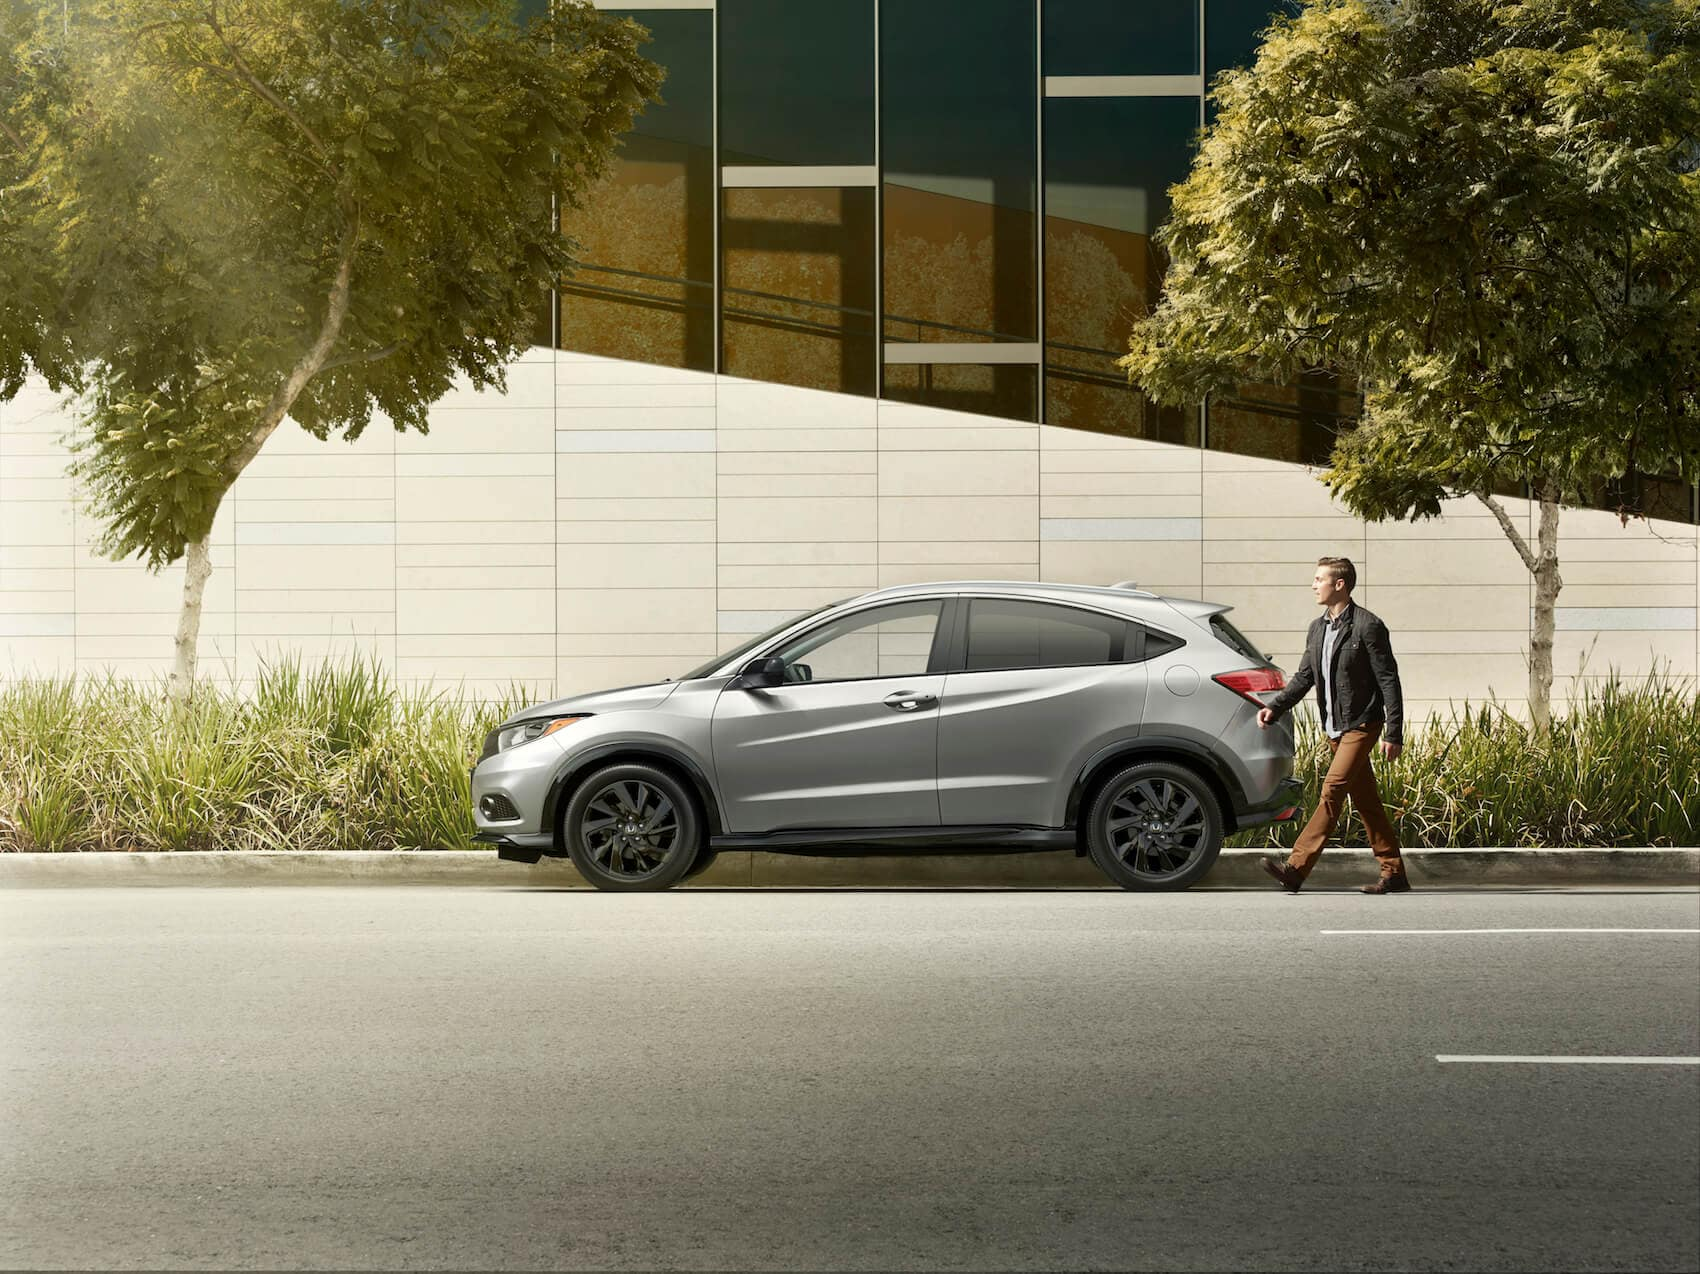 2021 Honda HR-V safety features